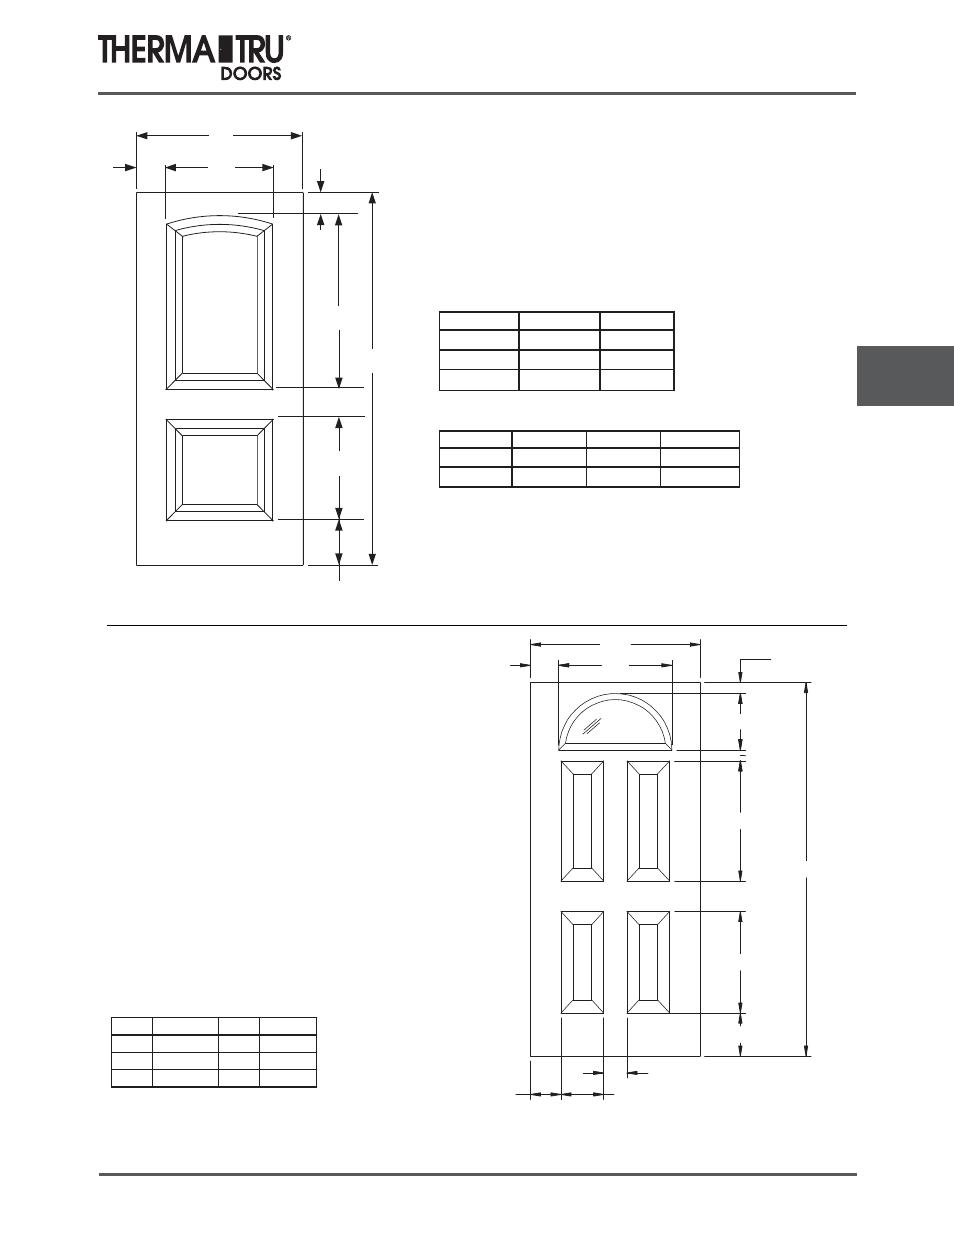 6/8 steel edge doors, 2 panel soft arch flush (slab undersize se002